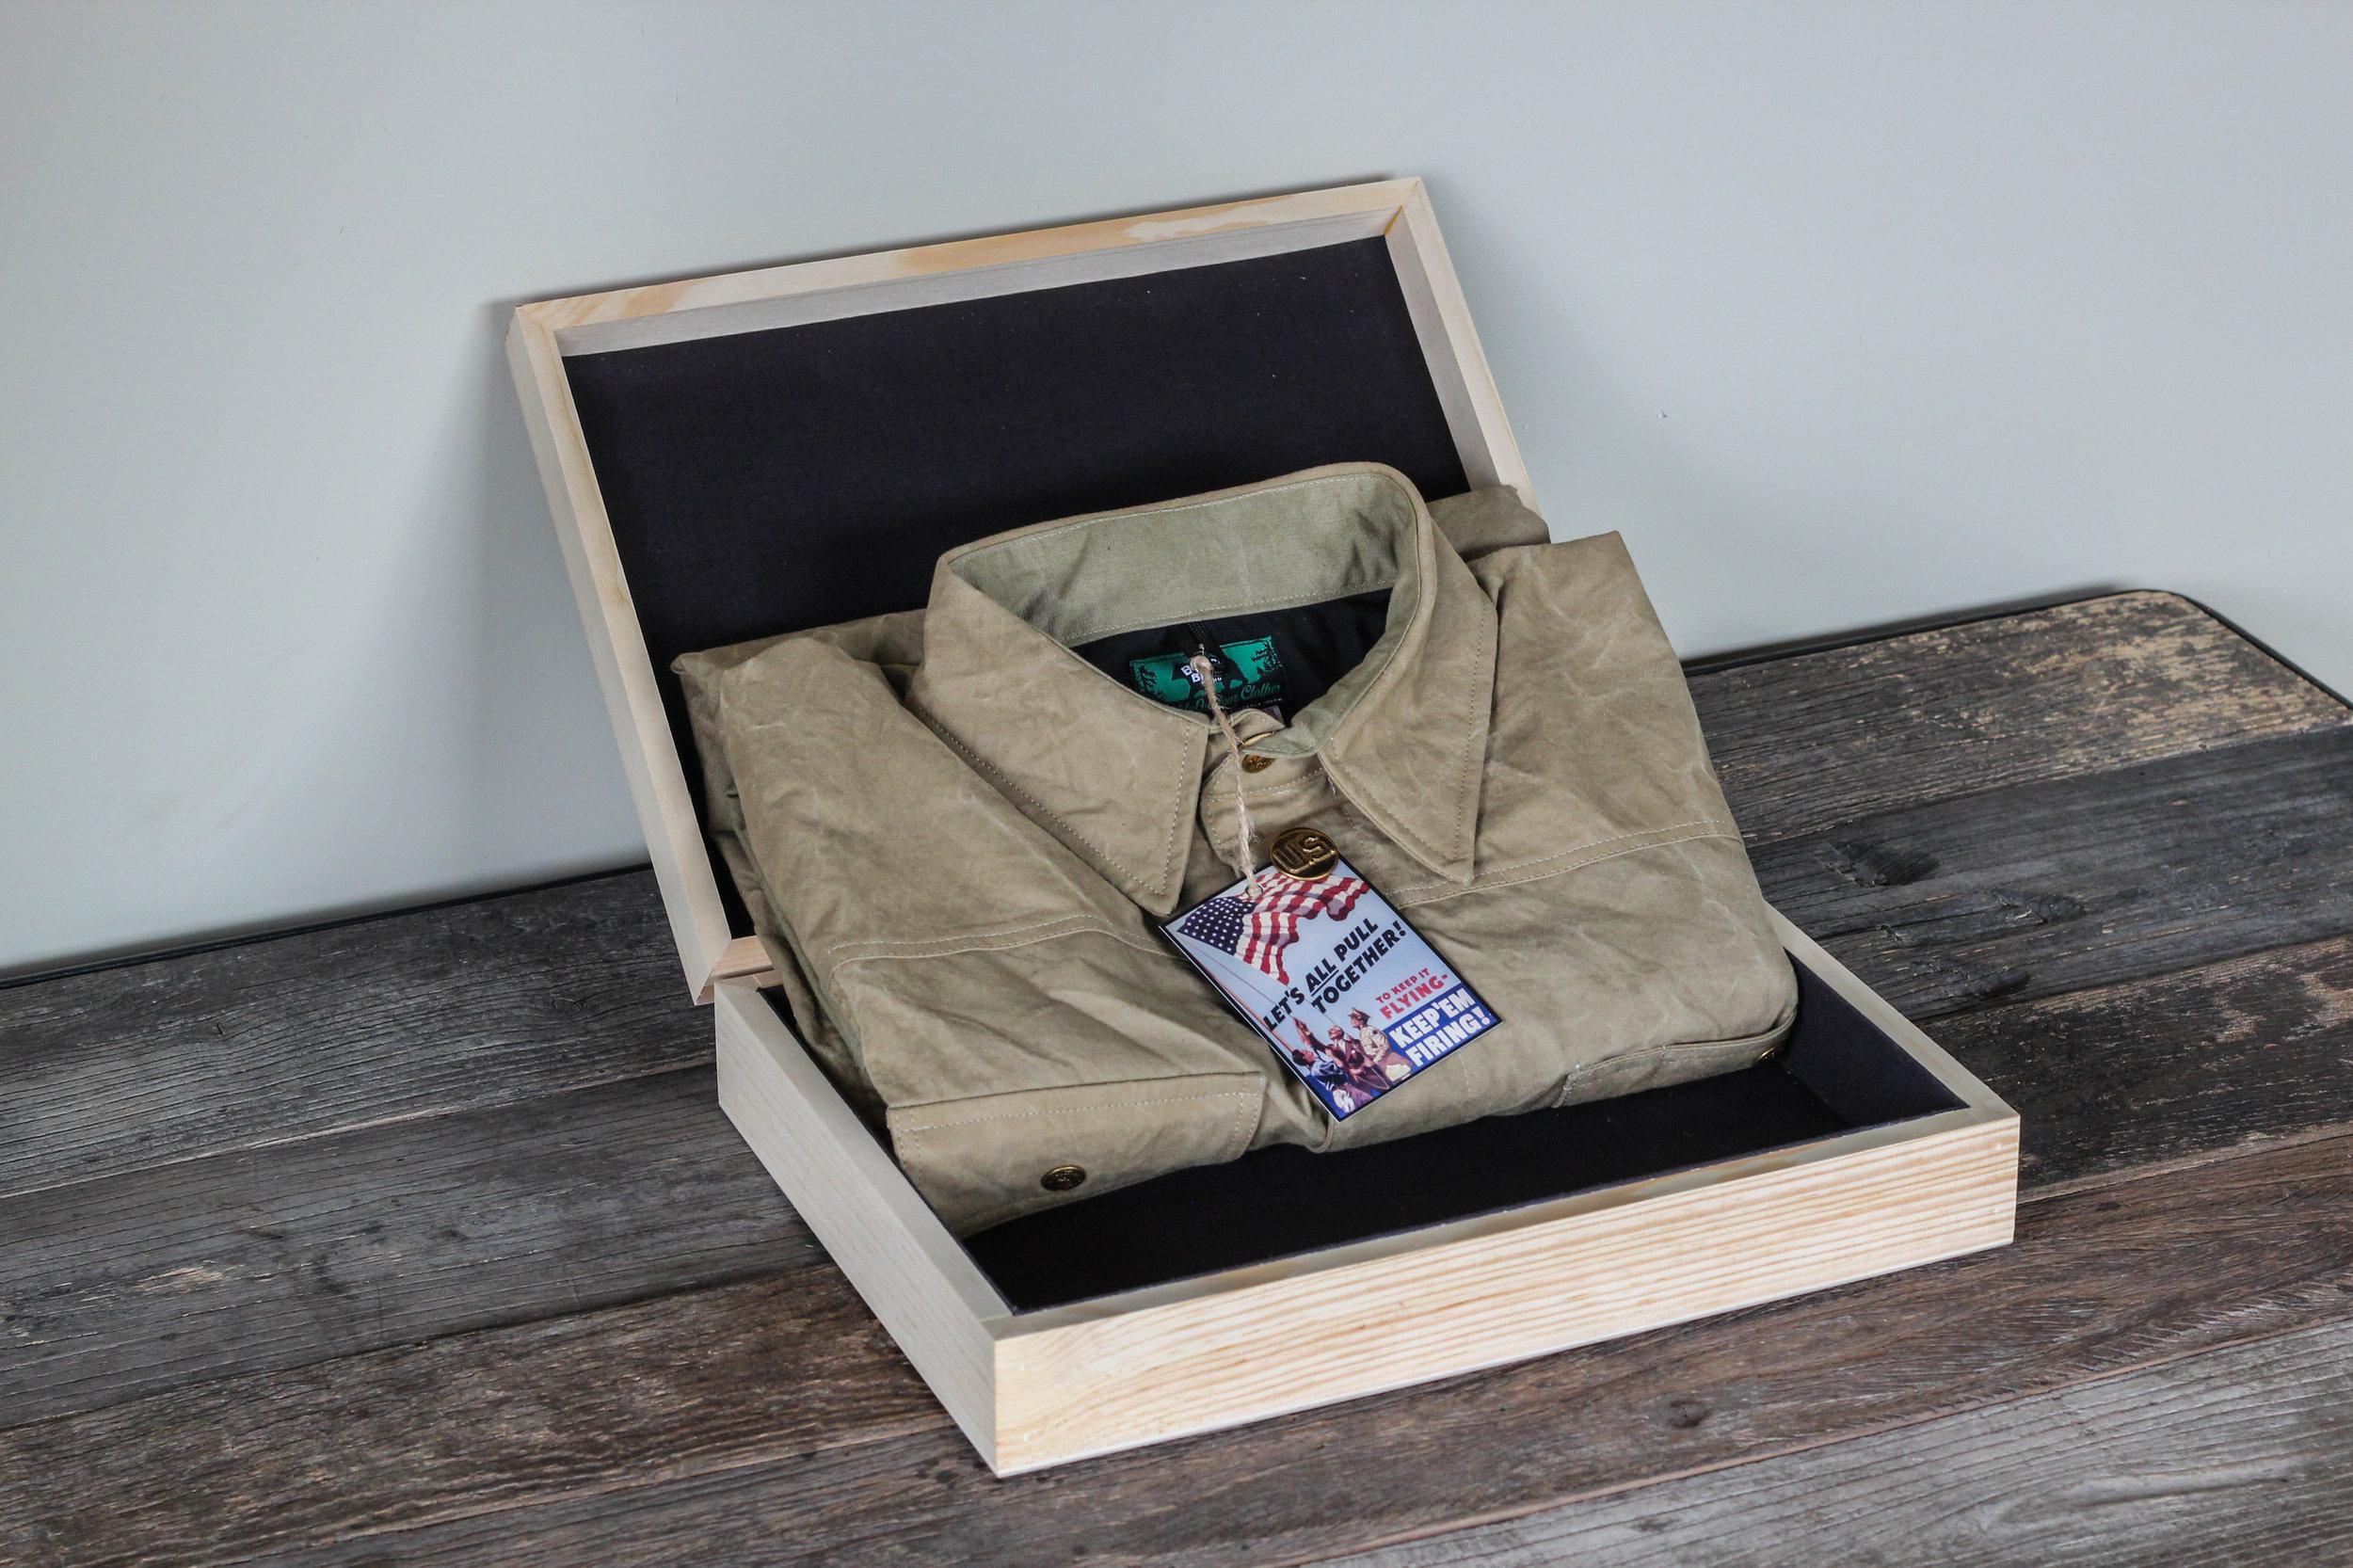 WWIIShirtInBox-9.jpg